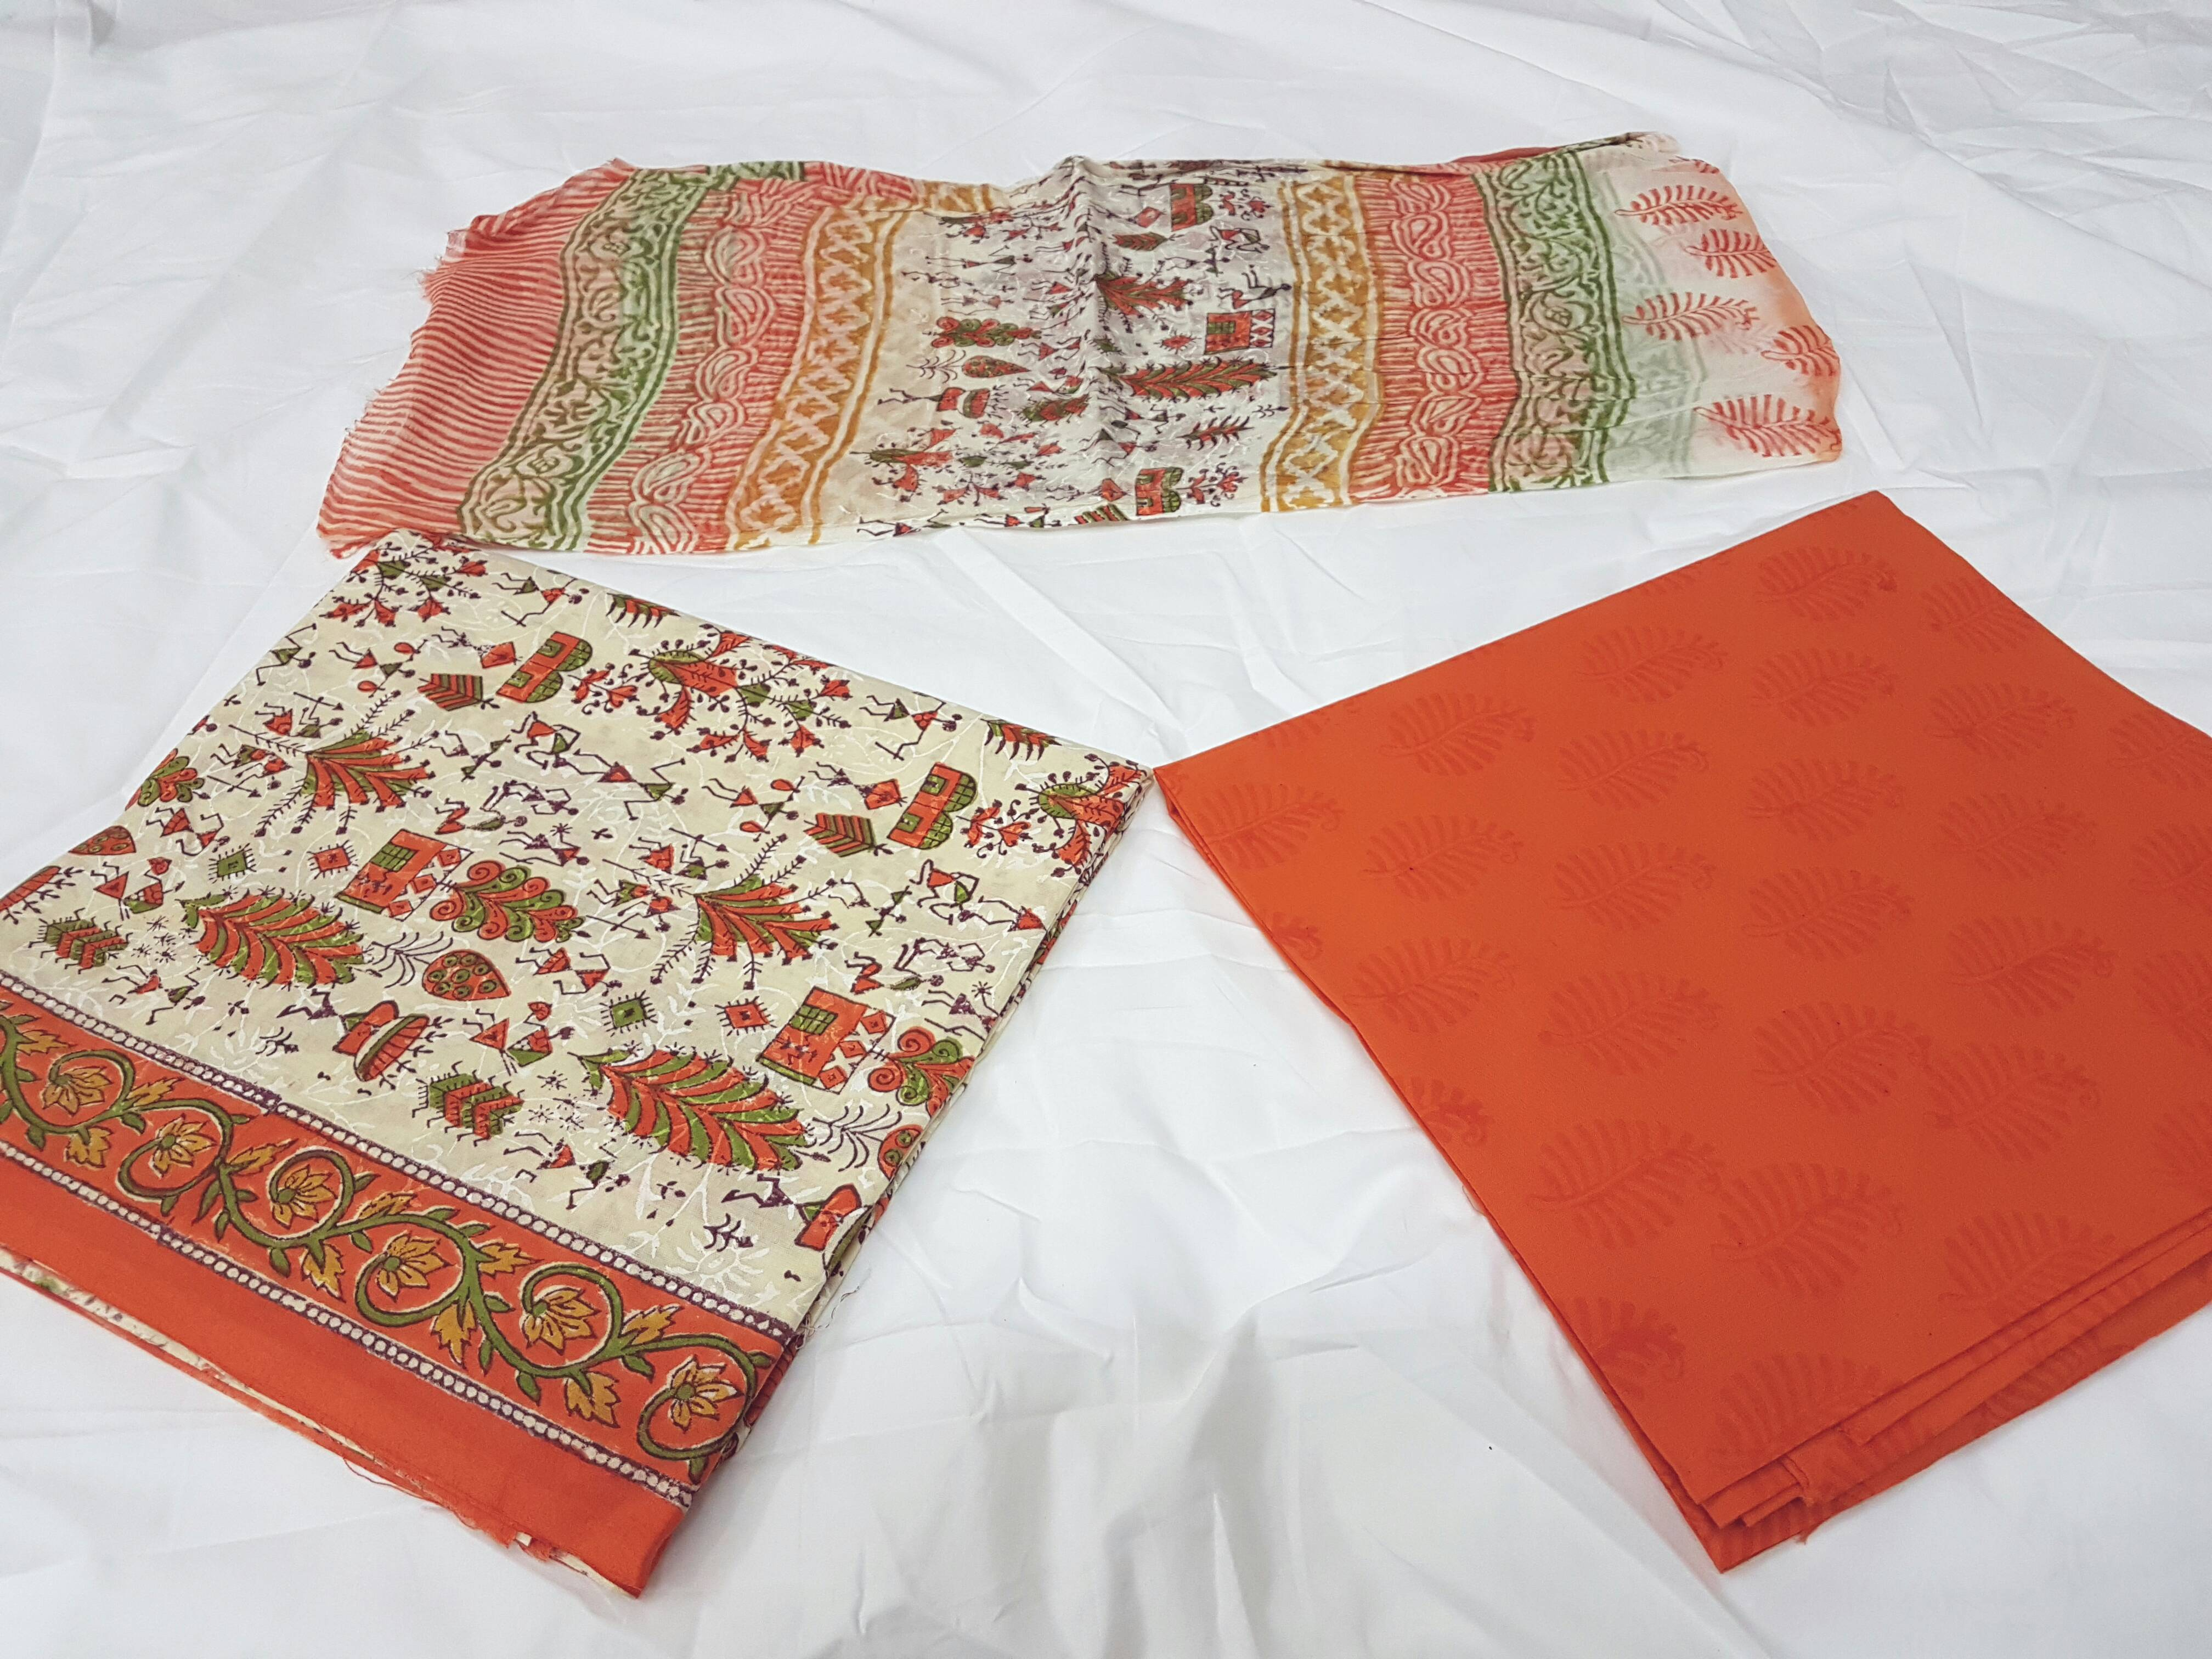 Tridev Febrics- Manufacturer of Hand Block Printed Materials